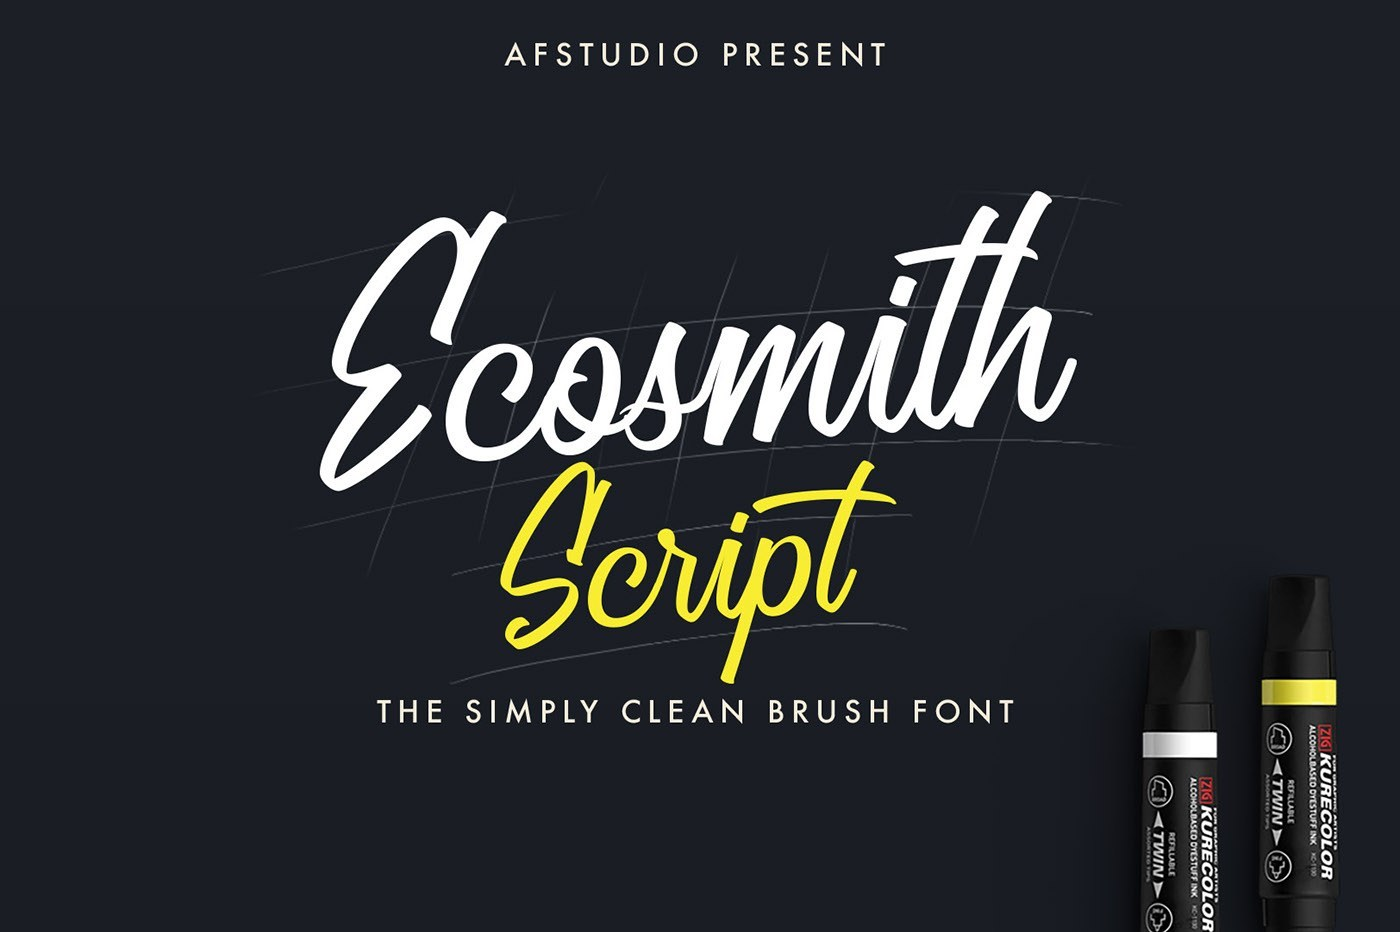 ecosmith-script-font